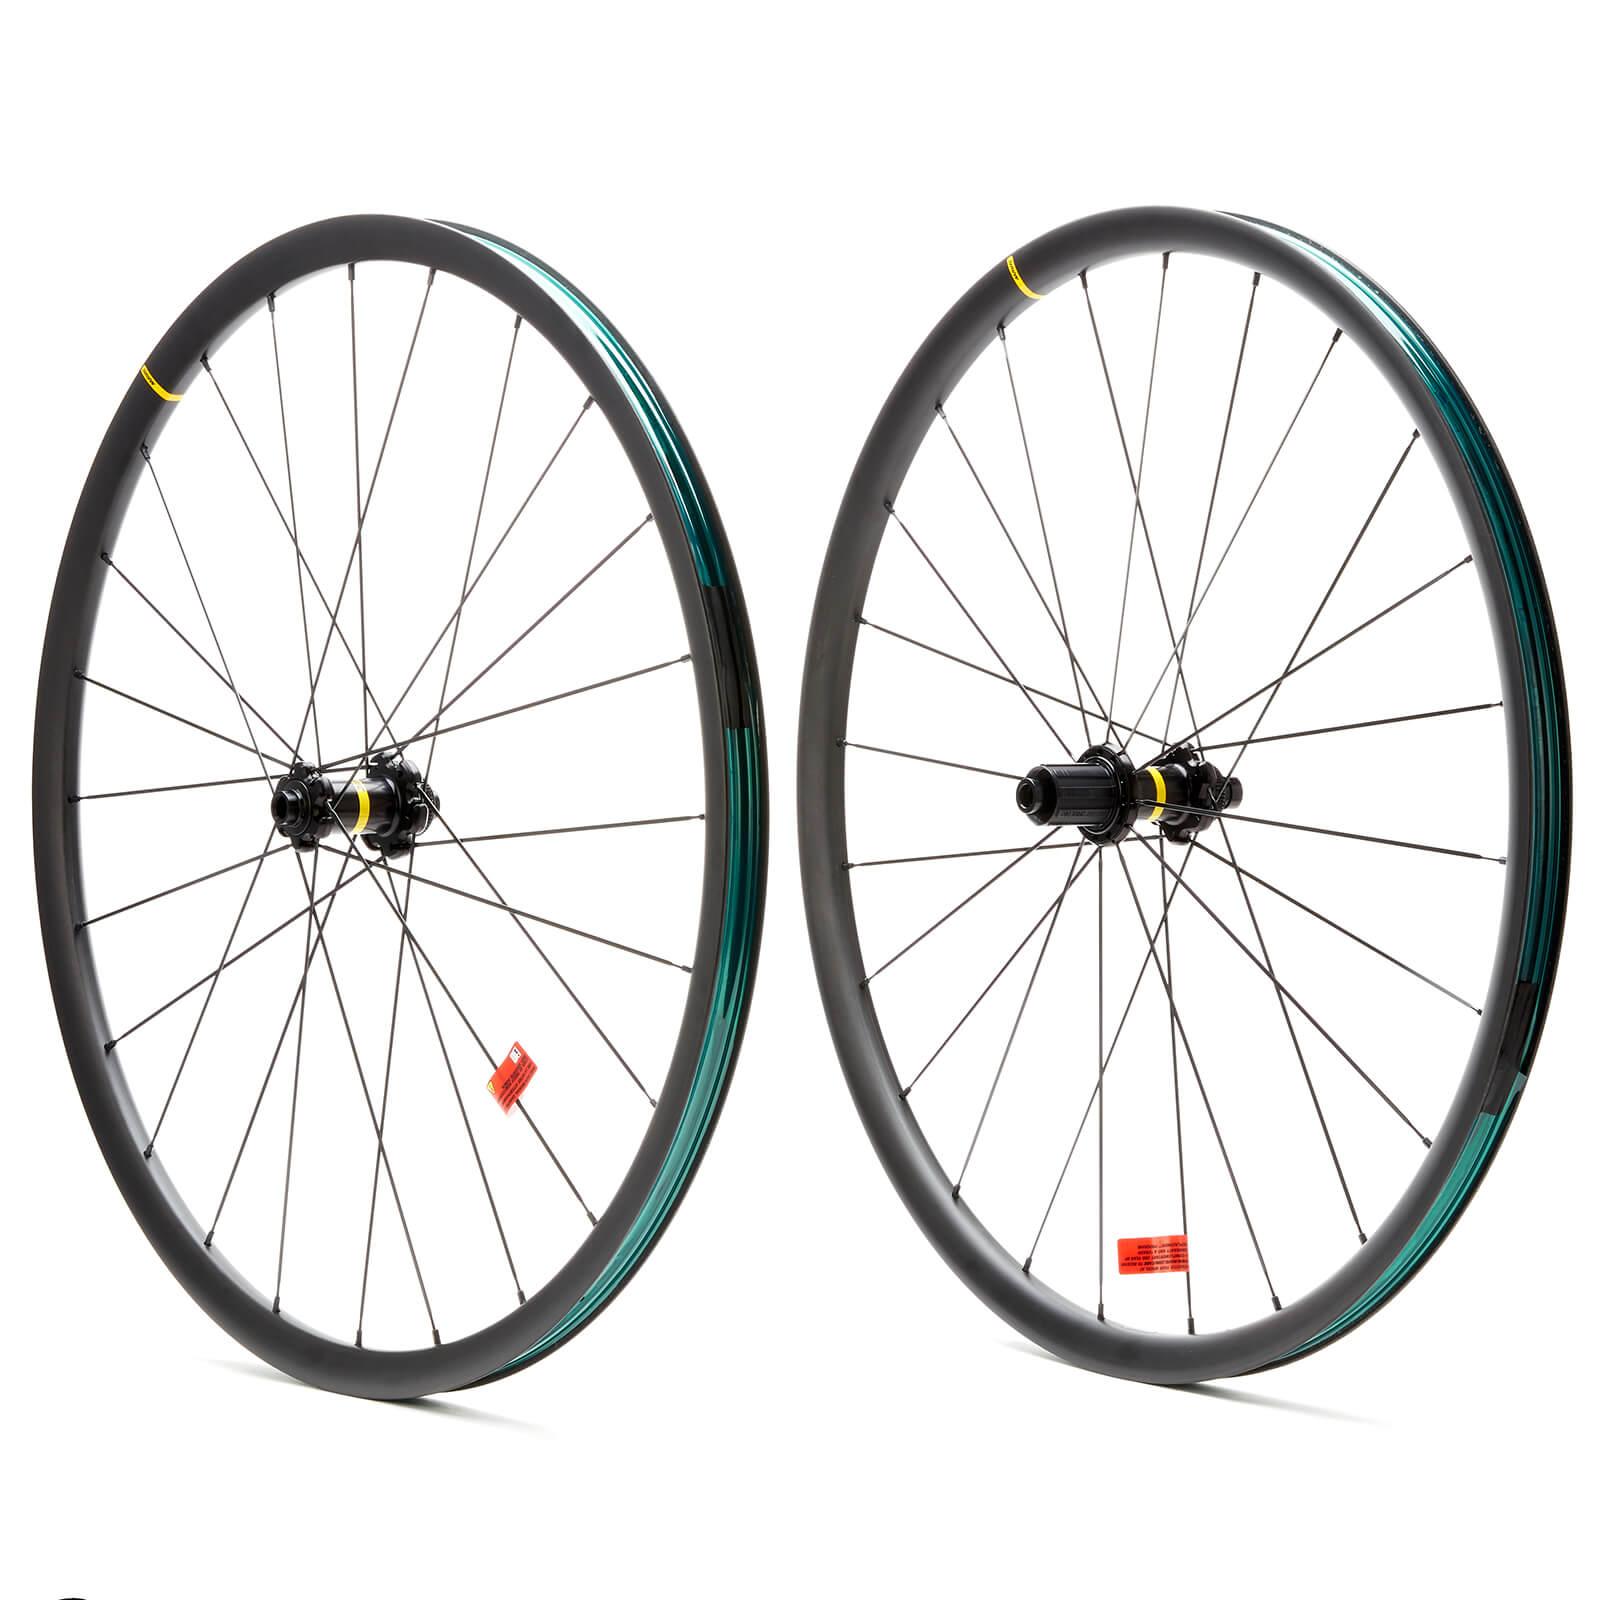 Mavic Allroad Pro Carbon Sl Disc Wheelset - 2021 - Shimano/sram